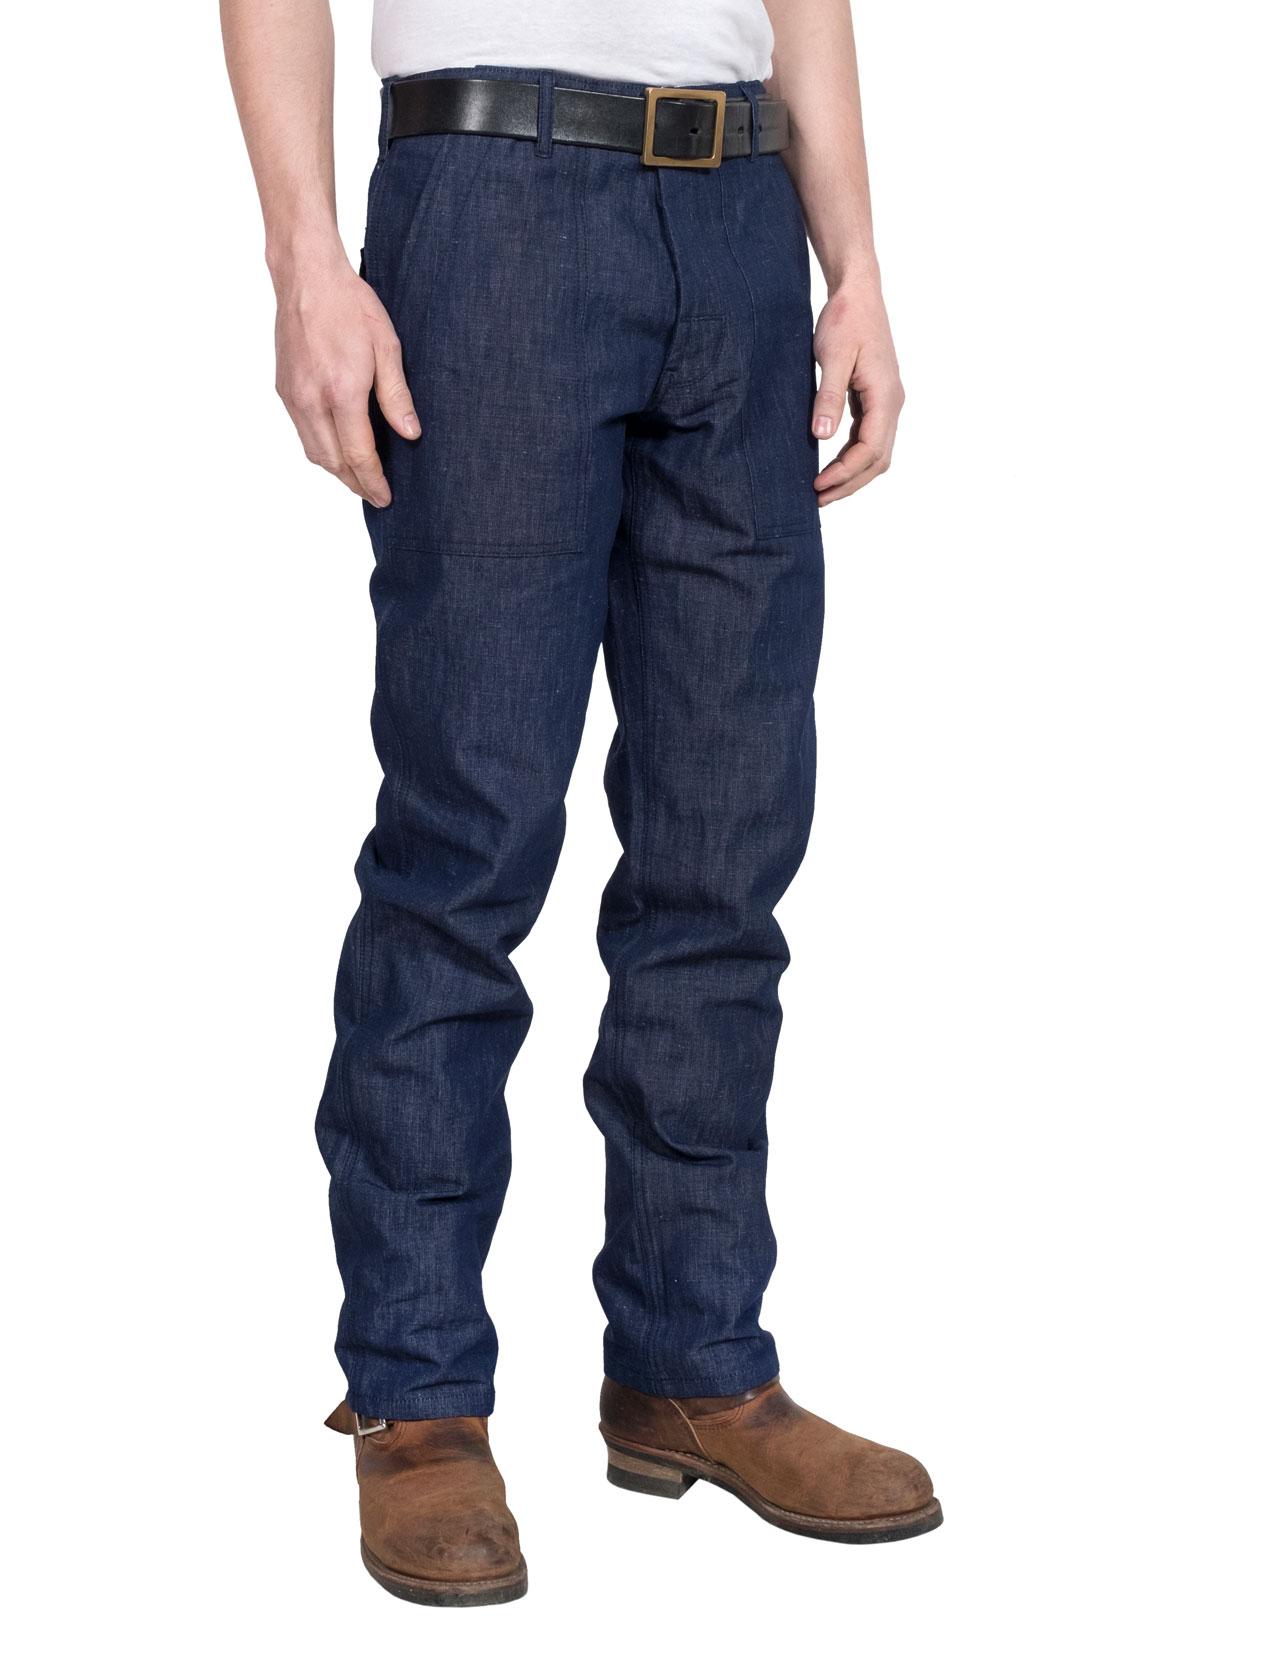 Eat Dust - Nautic Fatigue Azalea Pants - Indigo Blue 8d4d217a99e